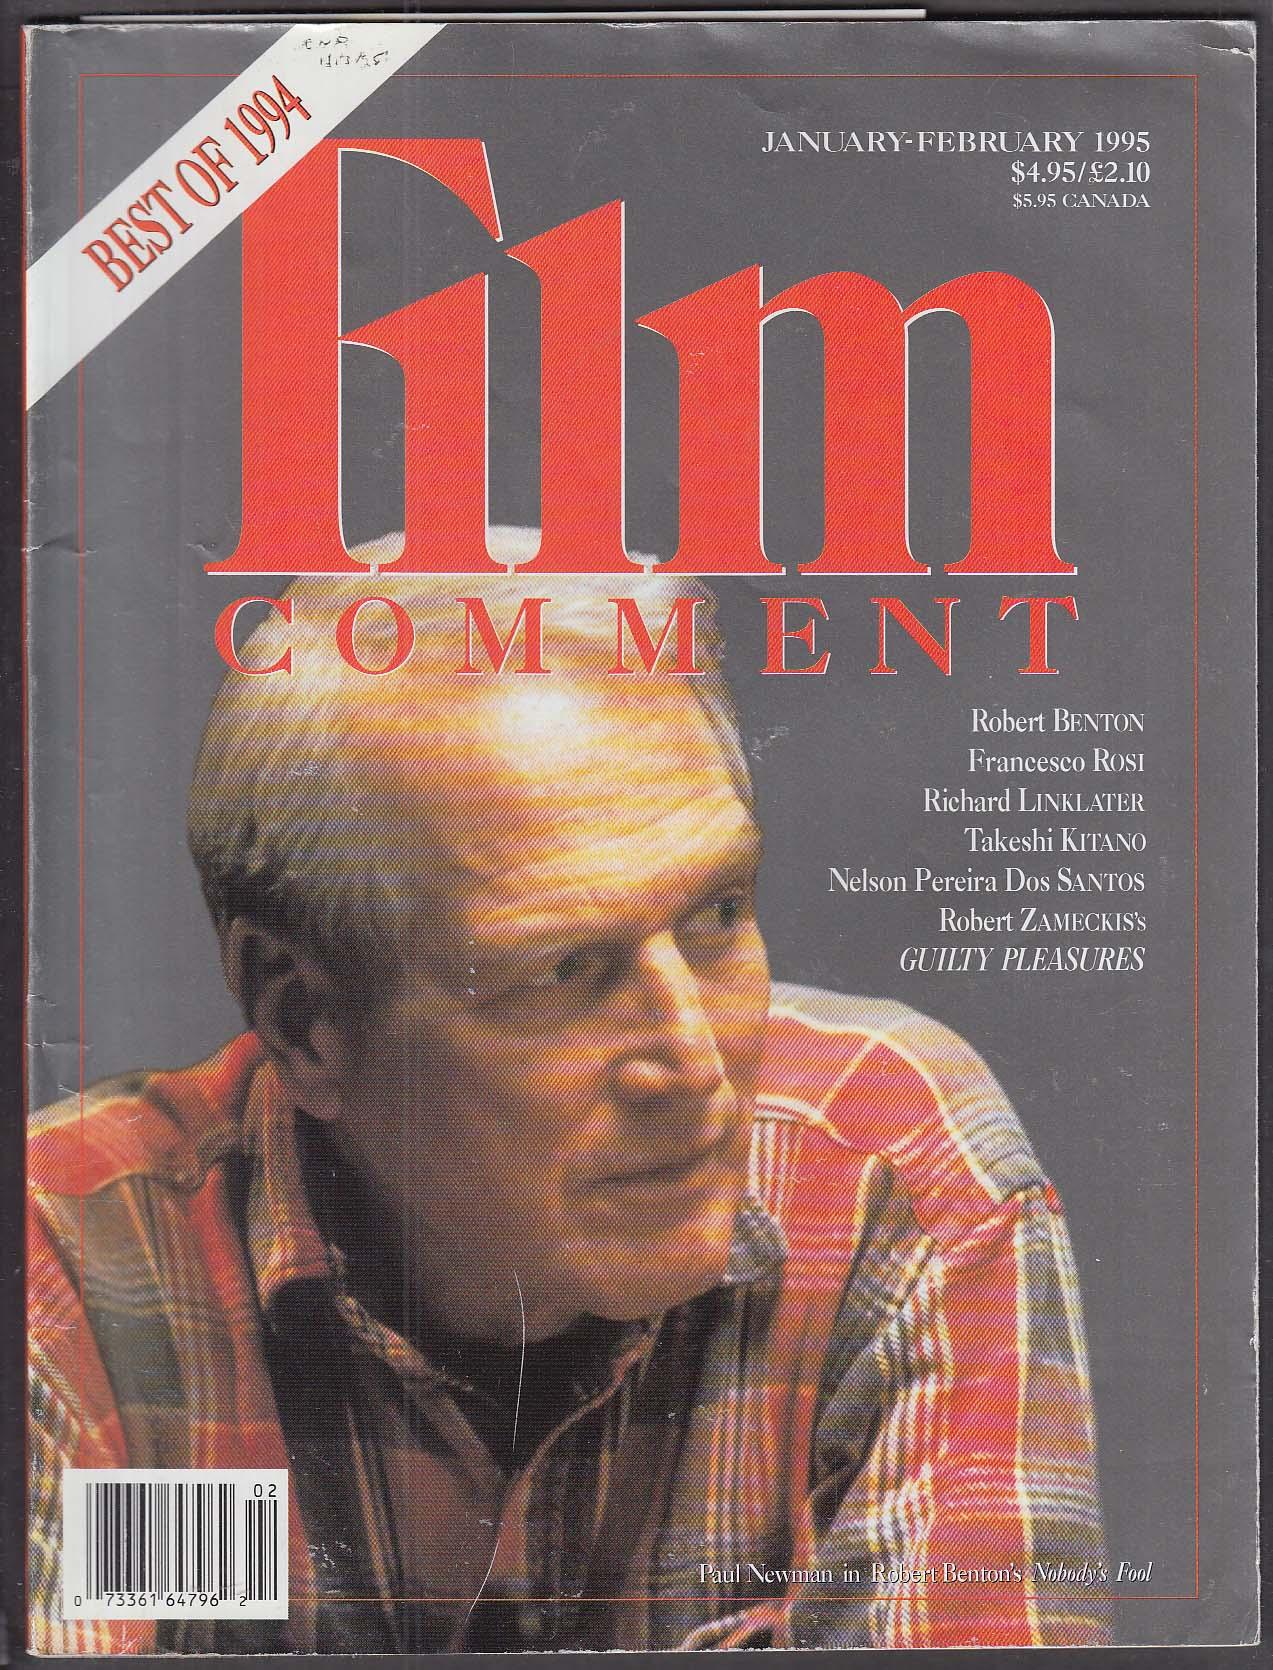 FILM COMMENT Best of 1994 Paul Newman Robert Benton Richard Linklater + 1/2 1995